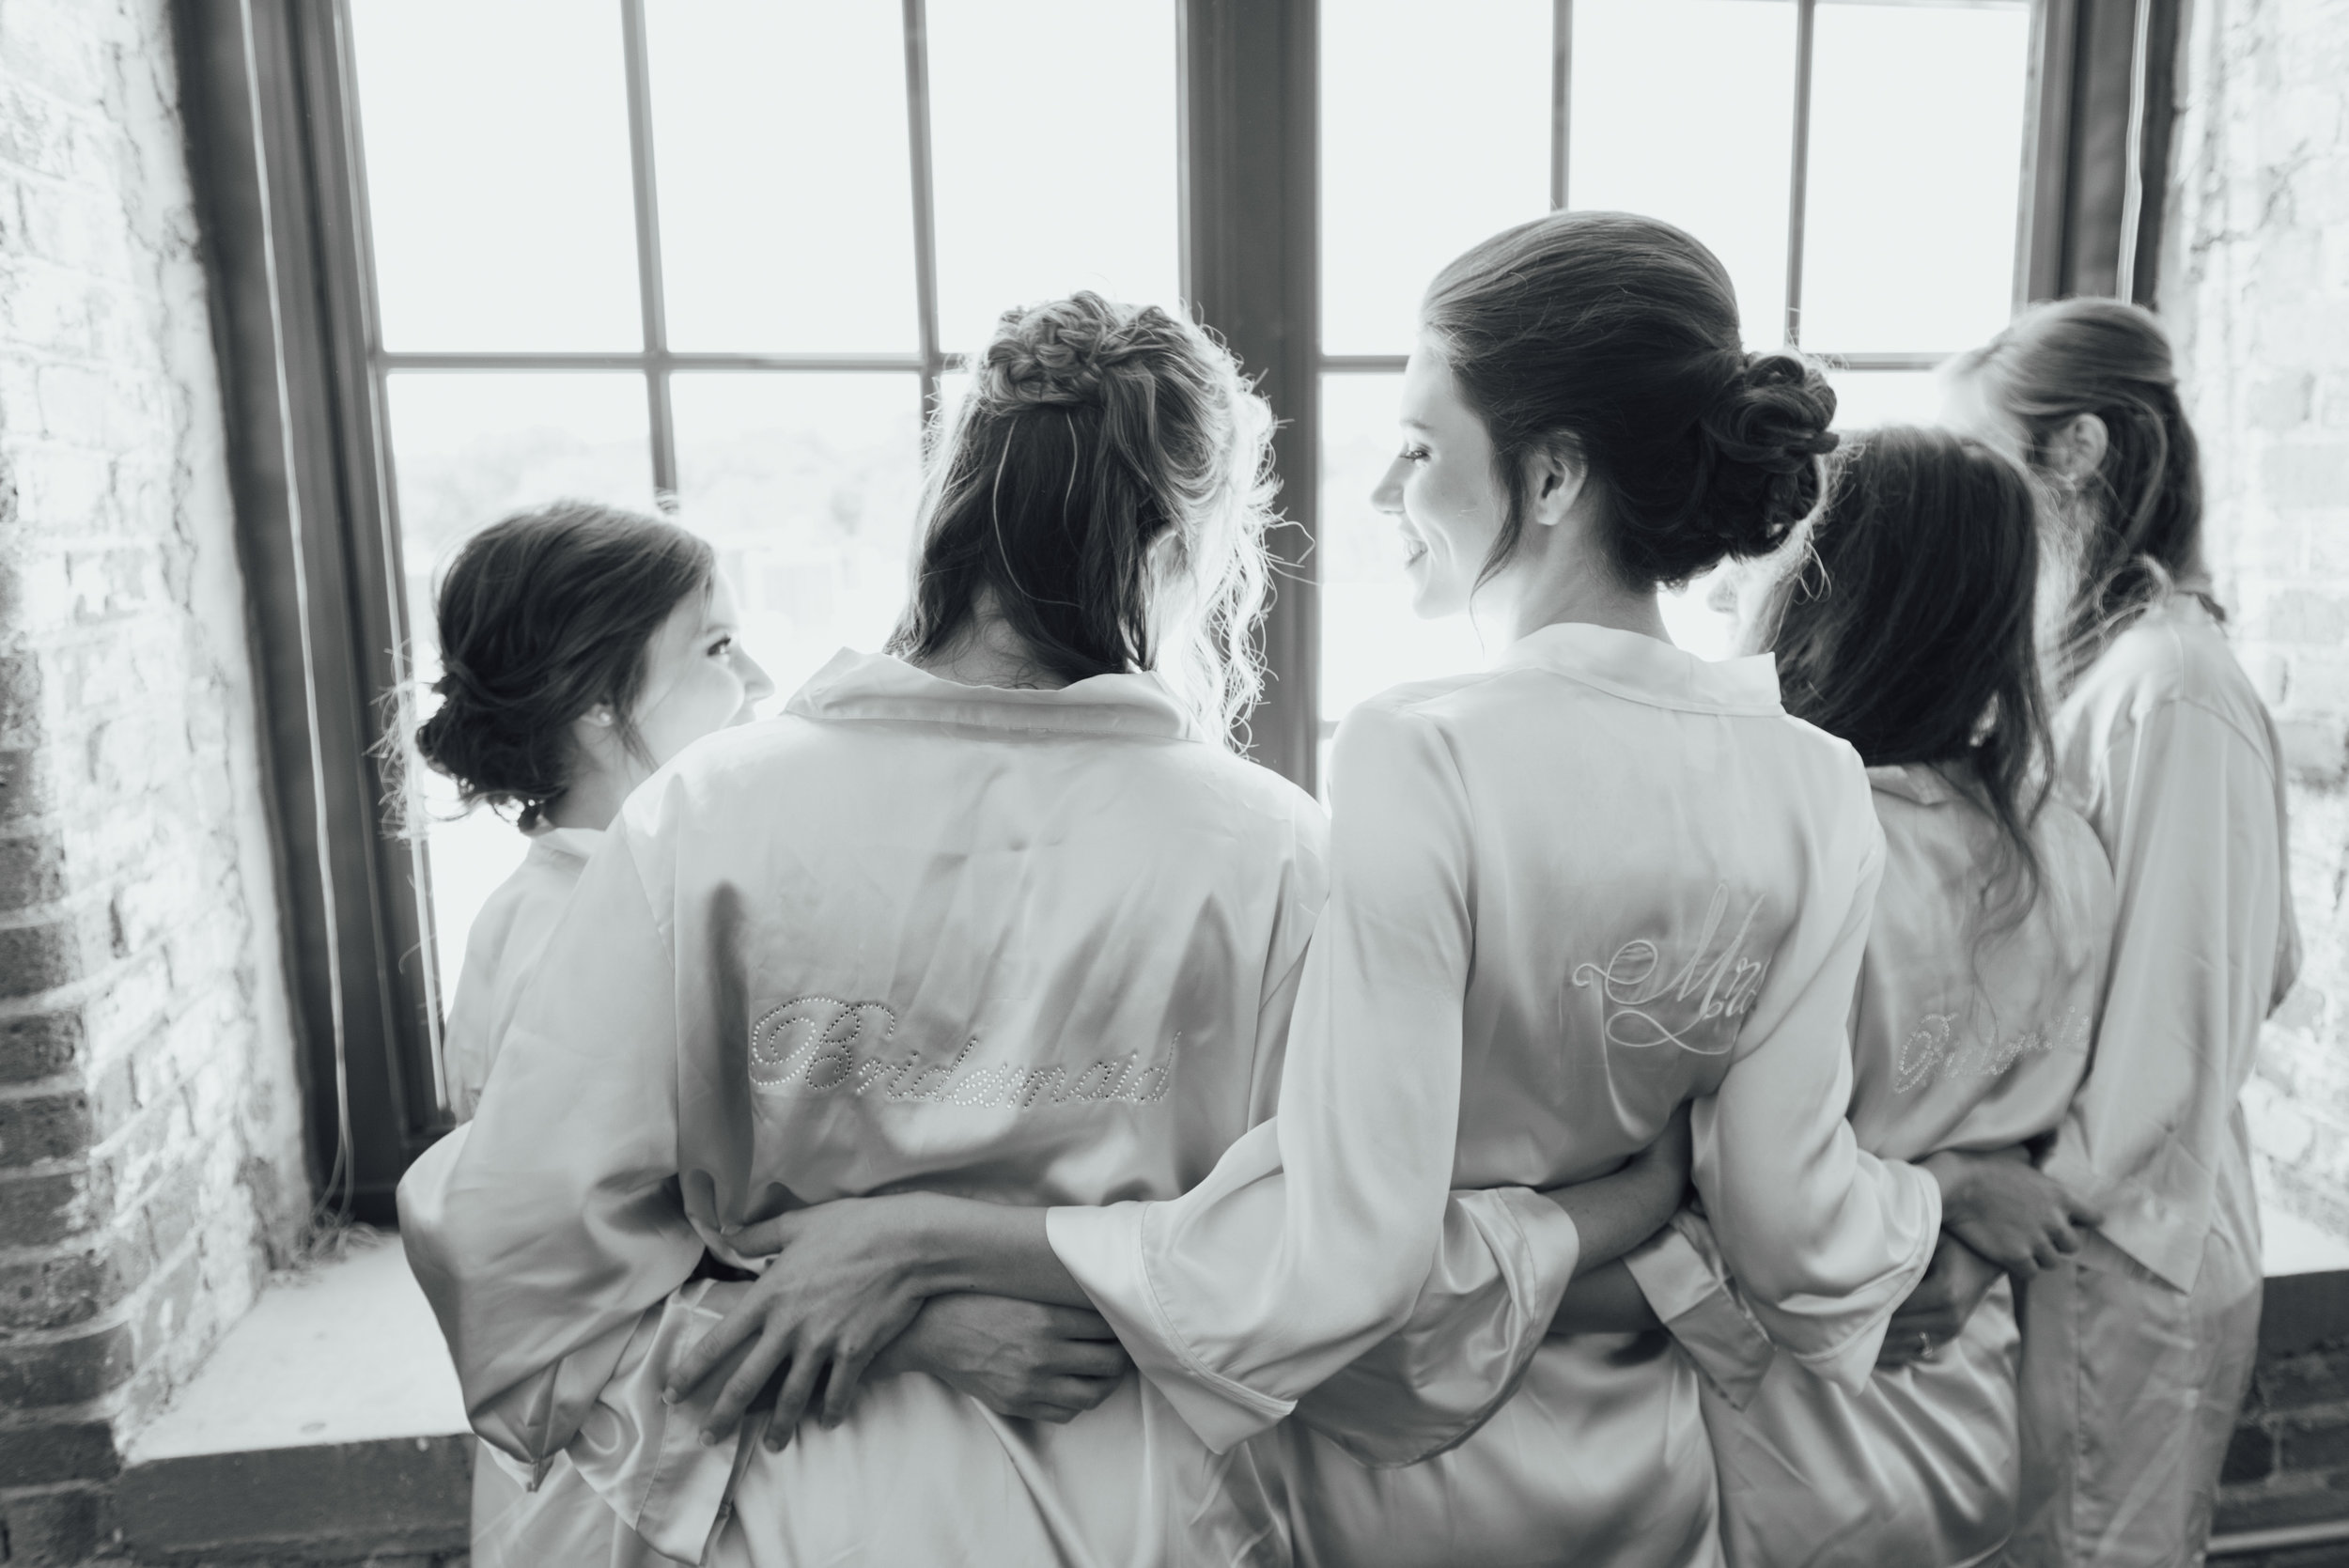 cleland-studios-wedding-photography-16.jpg